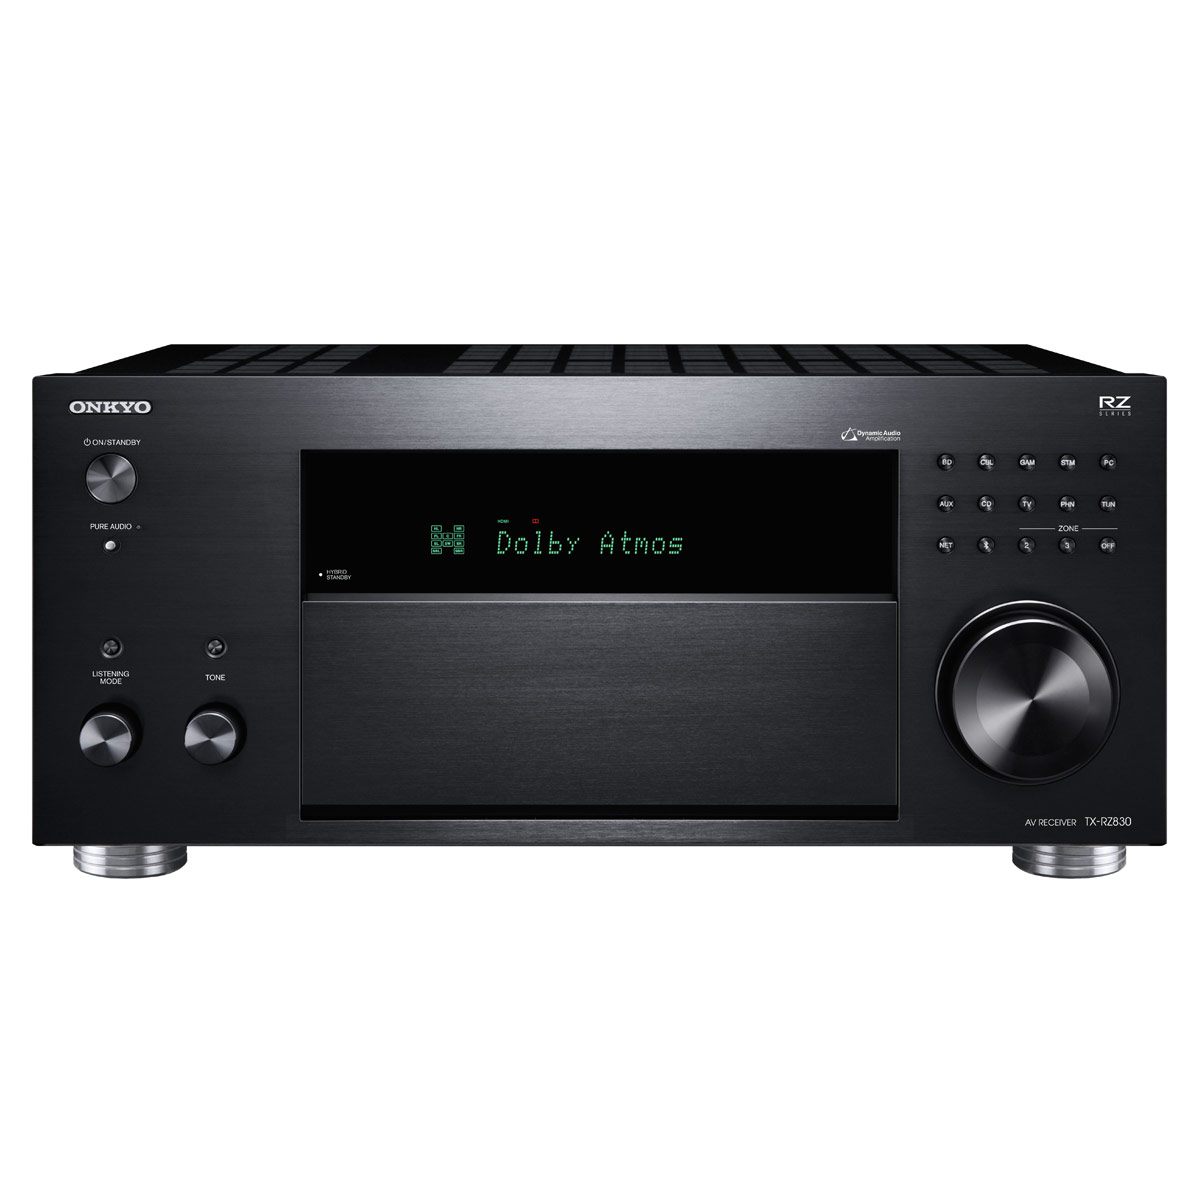 Ampli home cinéma Onkyo TX-RZ830 Noir Ampli-tuner Home Cinéma 9.2 - 180 Watts - THX - Wi-Fi/Bluetooth - Dolby Atmos - DTS:X - Multiroom - 4K/60p - HDCP 2.2 - AirPlay/Chromecast - Hi-Res Audio - 7 entrées HDMI